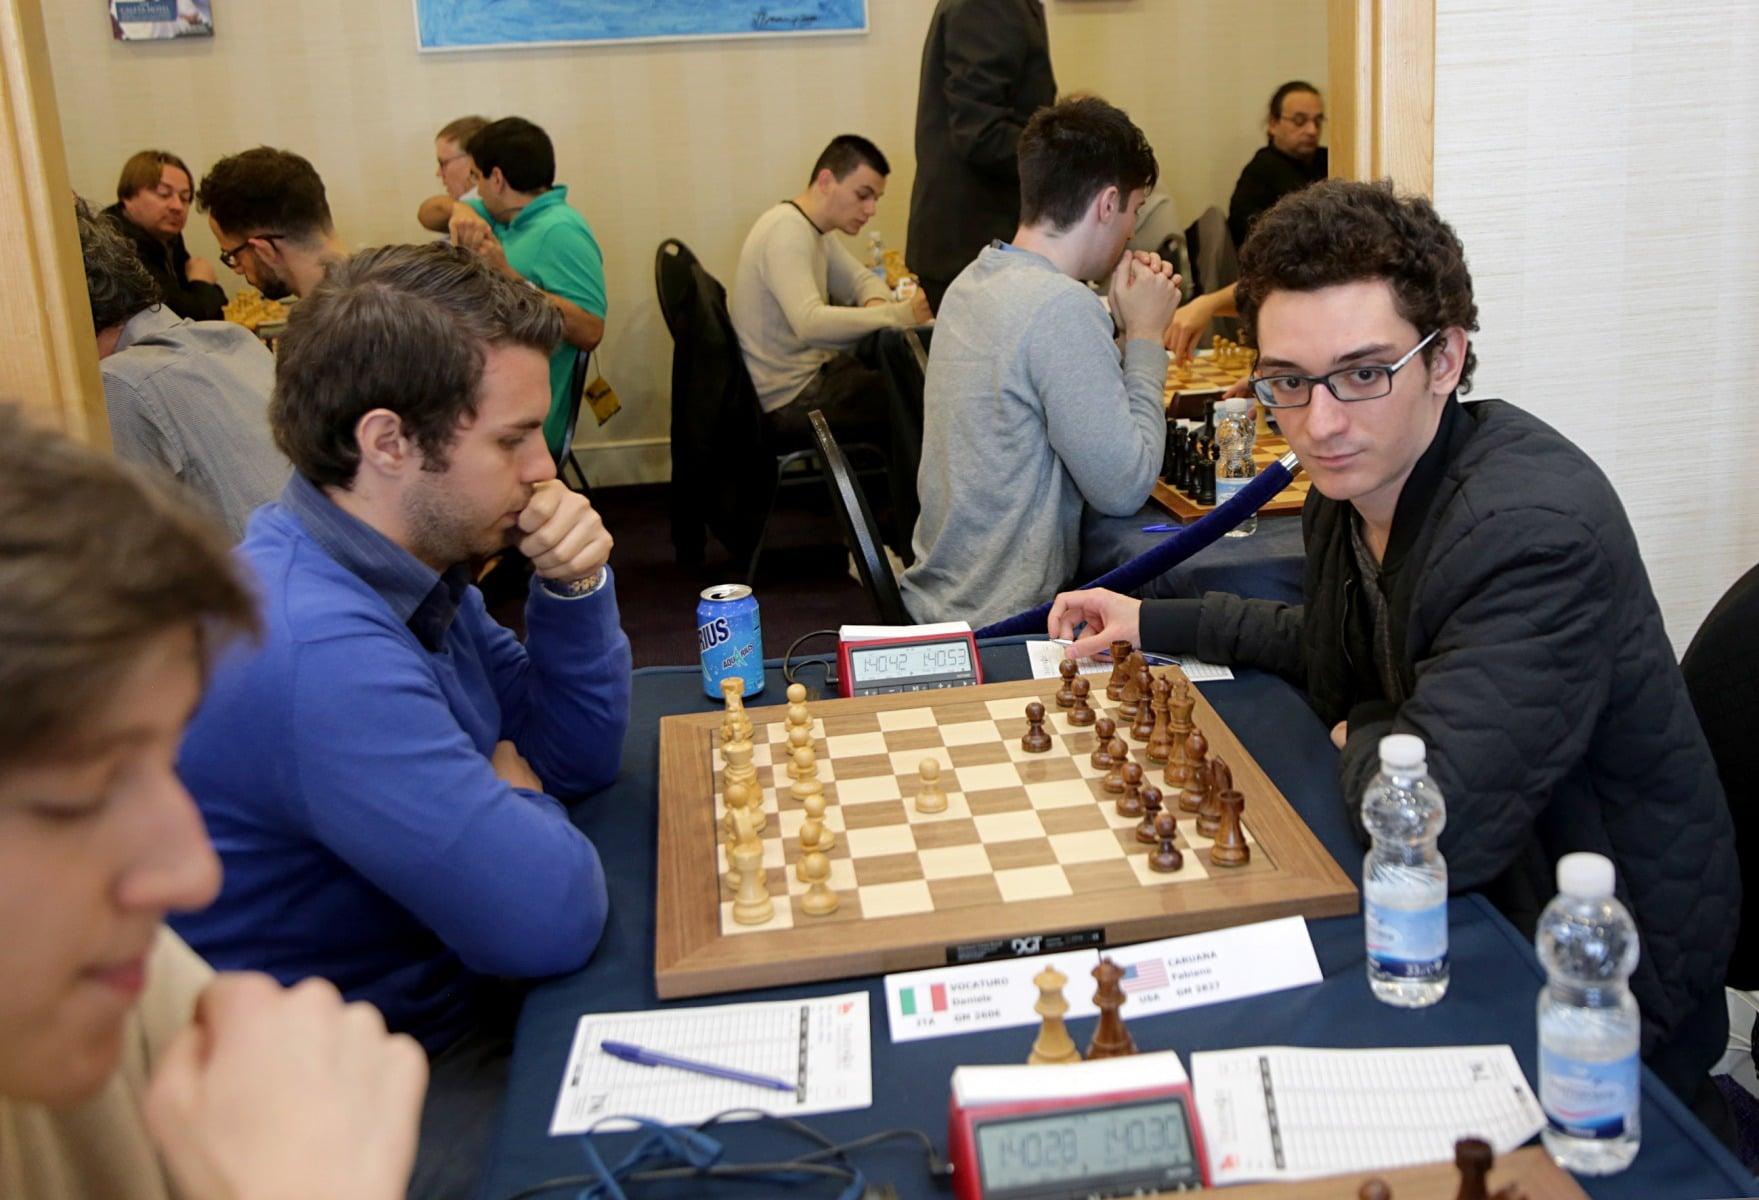 27-ene-17-fabin-picardo-visita-el-open-de-gibraltar-de-ajedrez-13_32513495316_o